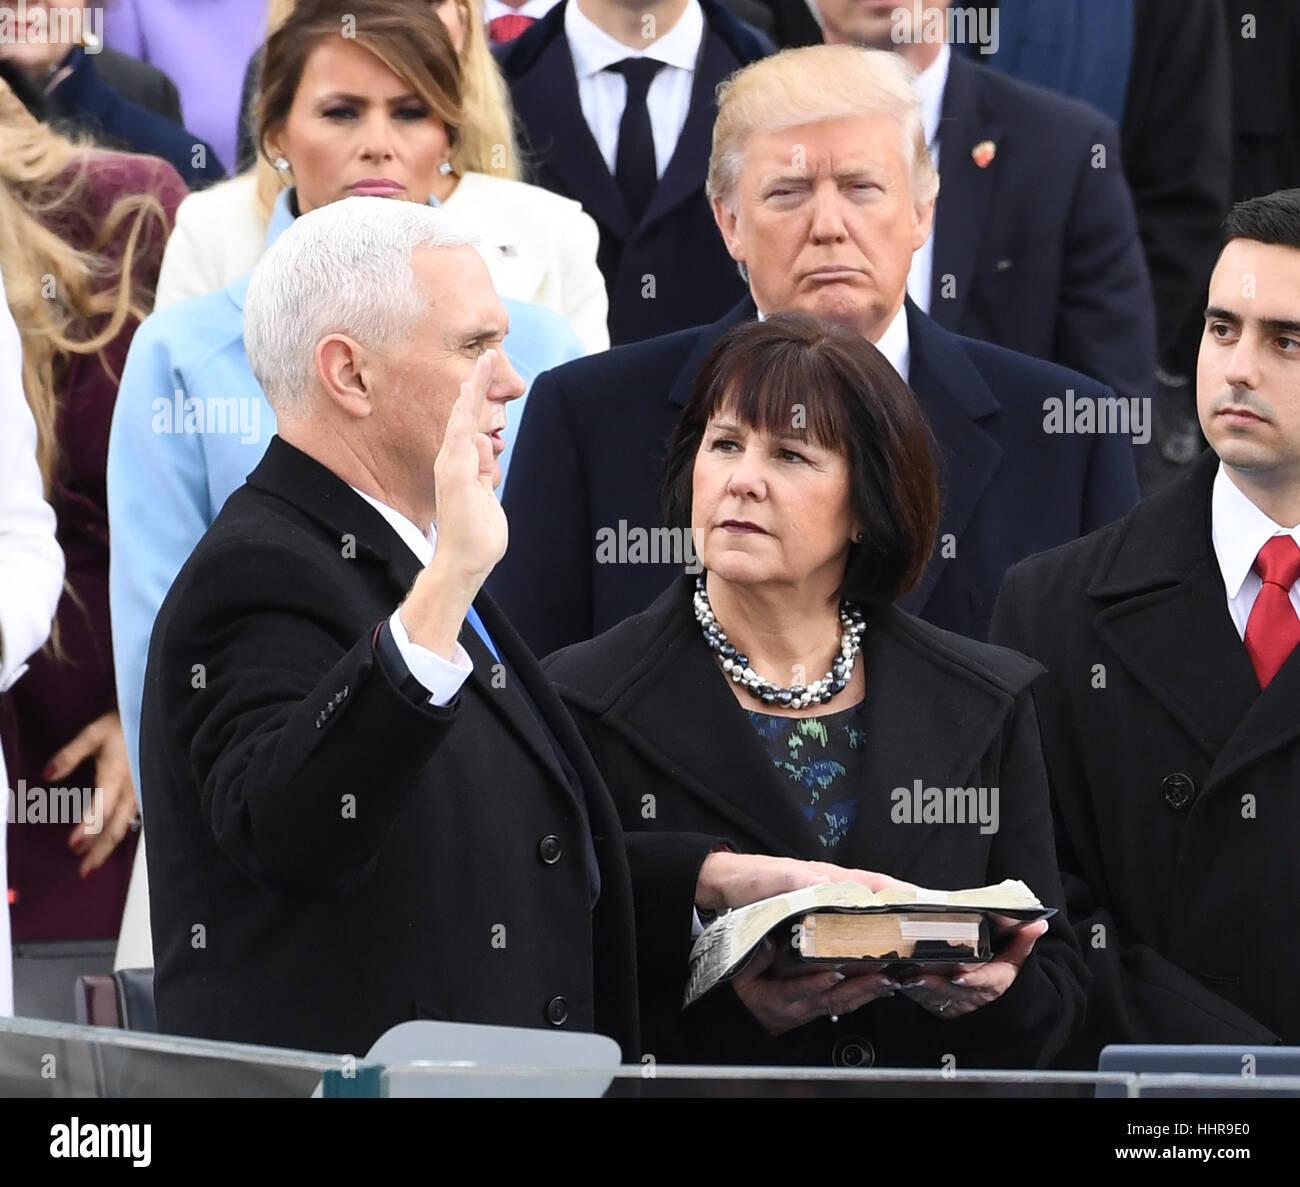 Washington DC, USA. 20. Januar 2017. Vice President Mike Pence nimmt der Eid des Amtes von Richter Clarance Thomas Stockbild